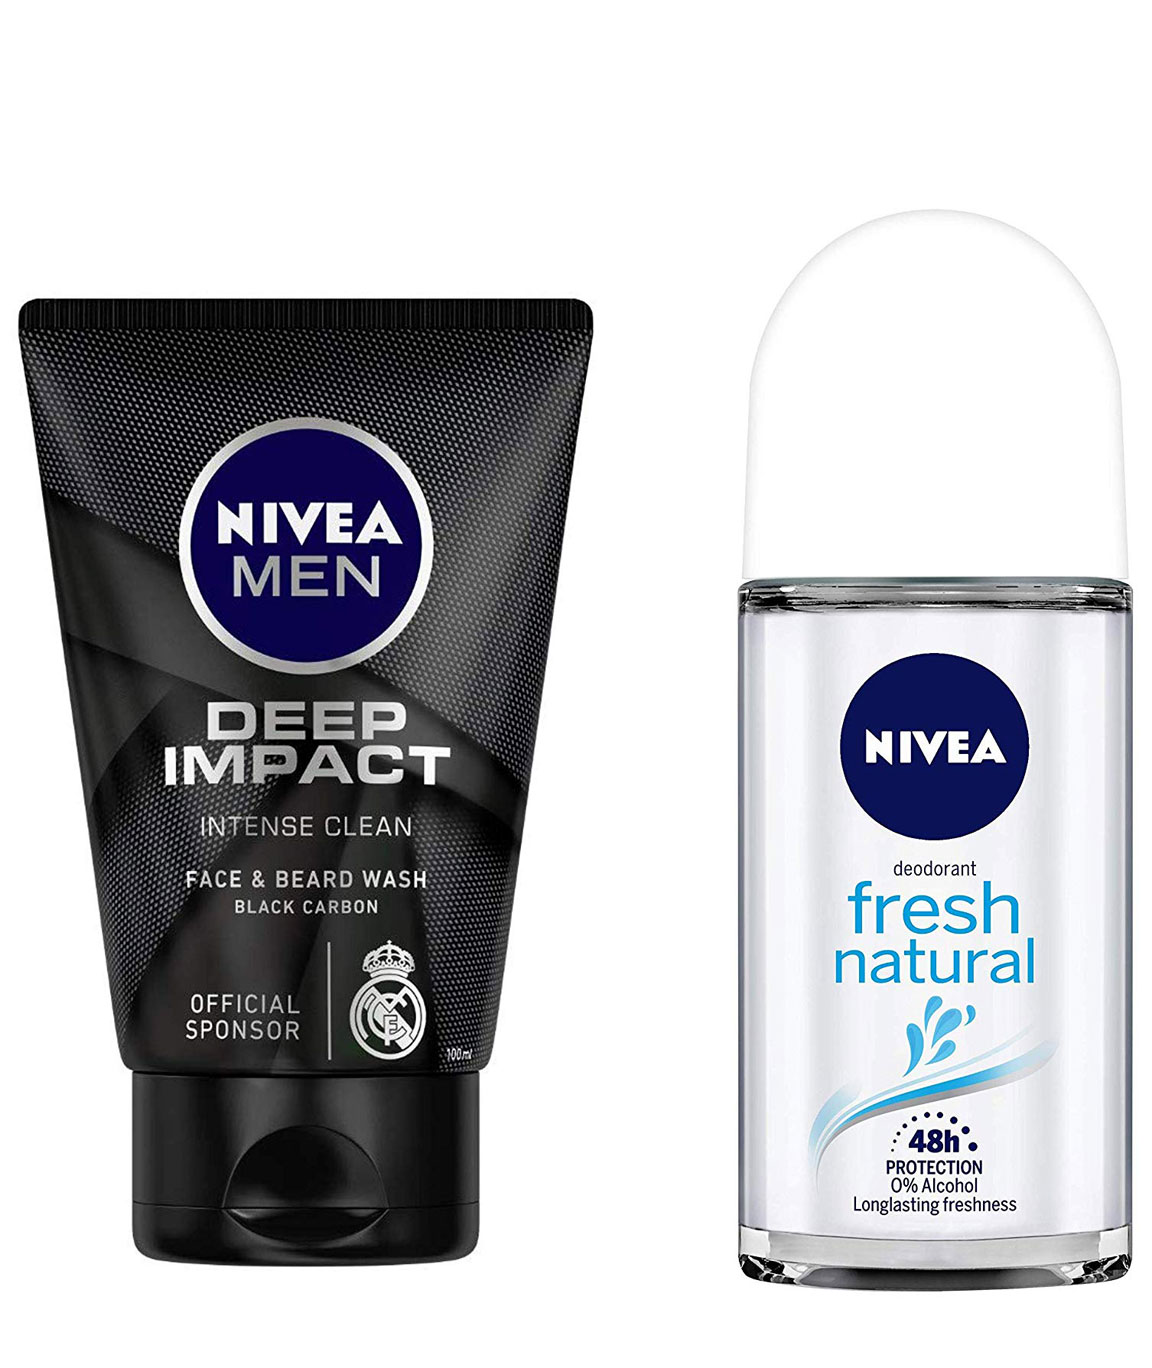 NIVEA MEN Face & Beard Wash, Deep Impact Intense Clean, 100ml & Deodorant Roll-on, Fresh Natural, 50ml Combo